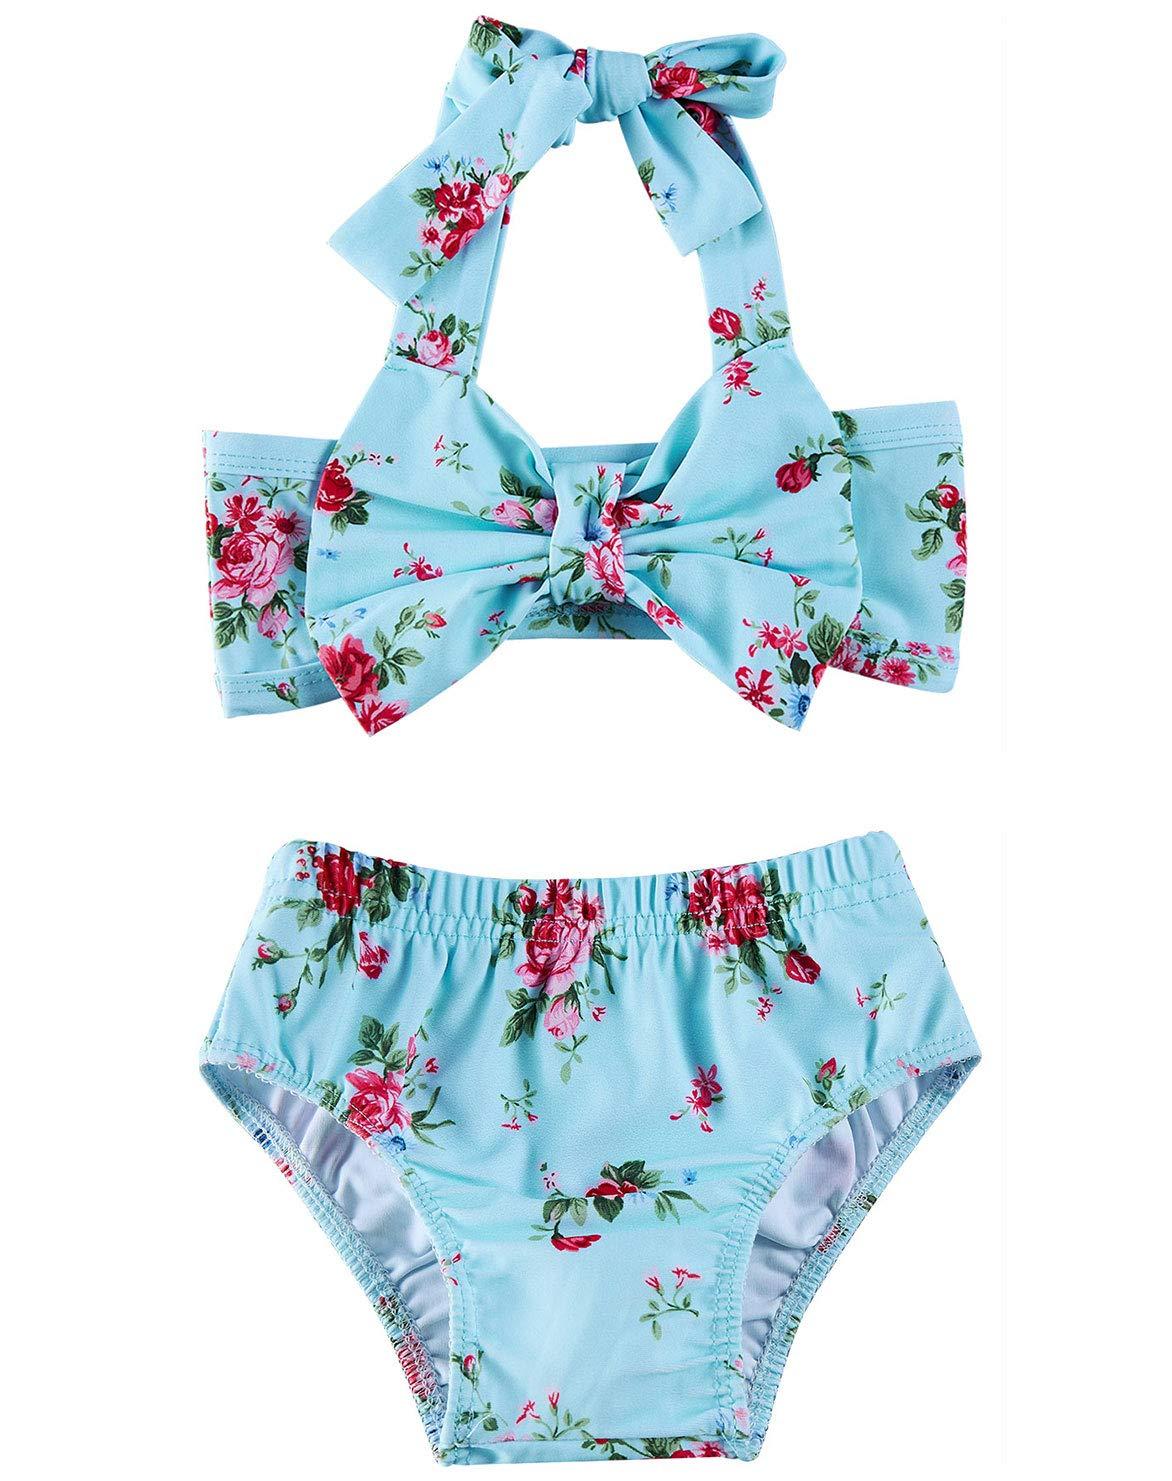 2Pcs Baby Girls Halter Bowknot Tube Top+Floral Short Bottoms Bikini Bathing Suit Swinwear